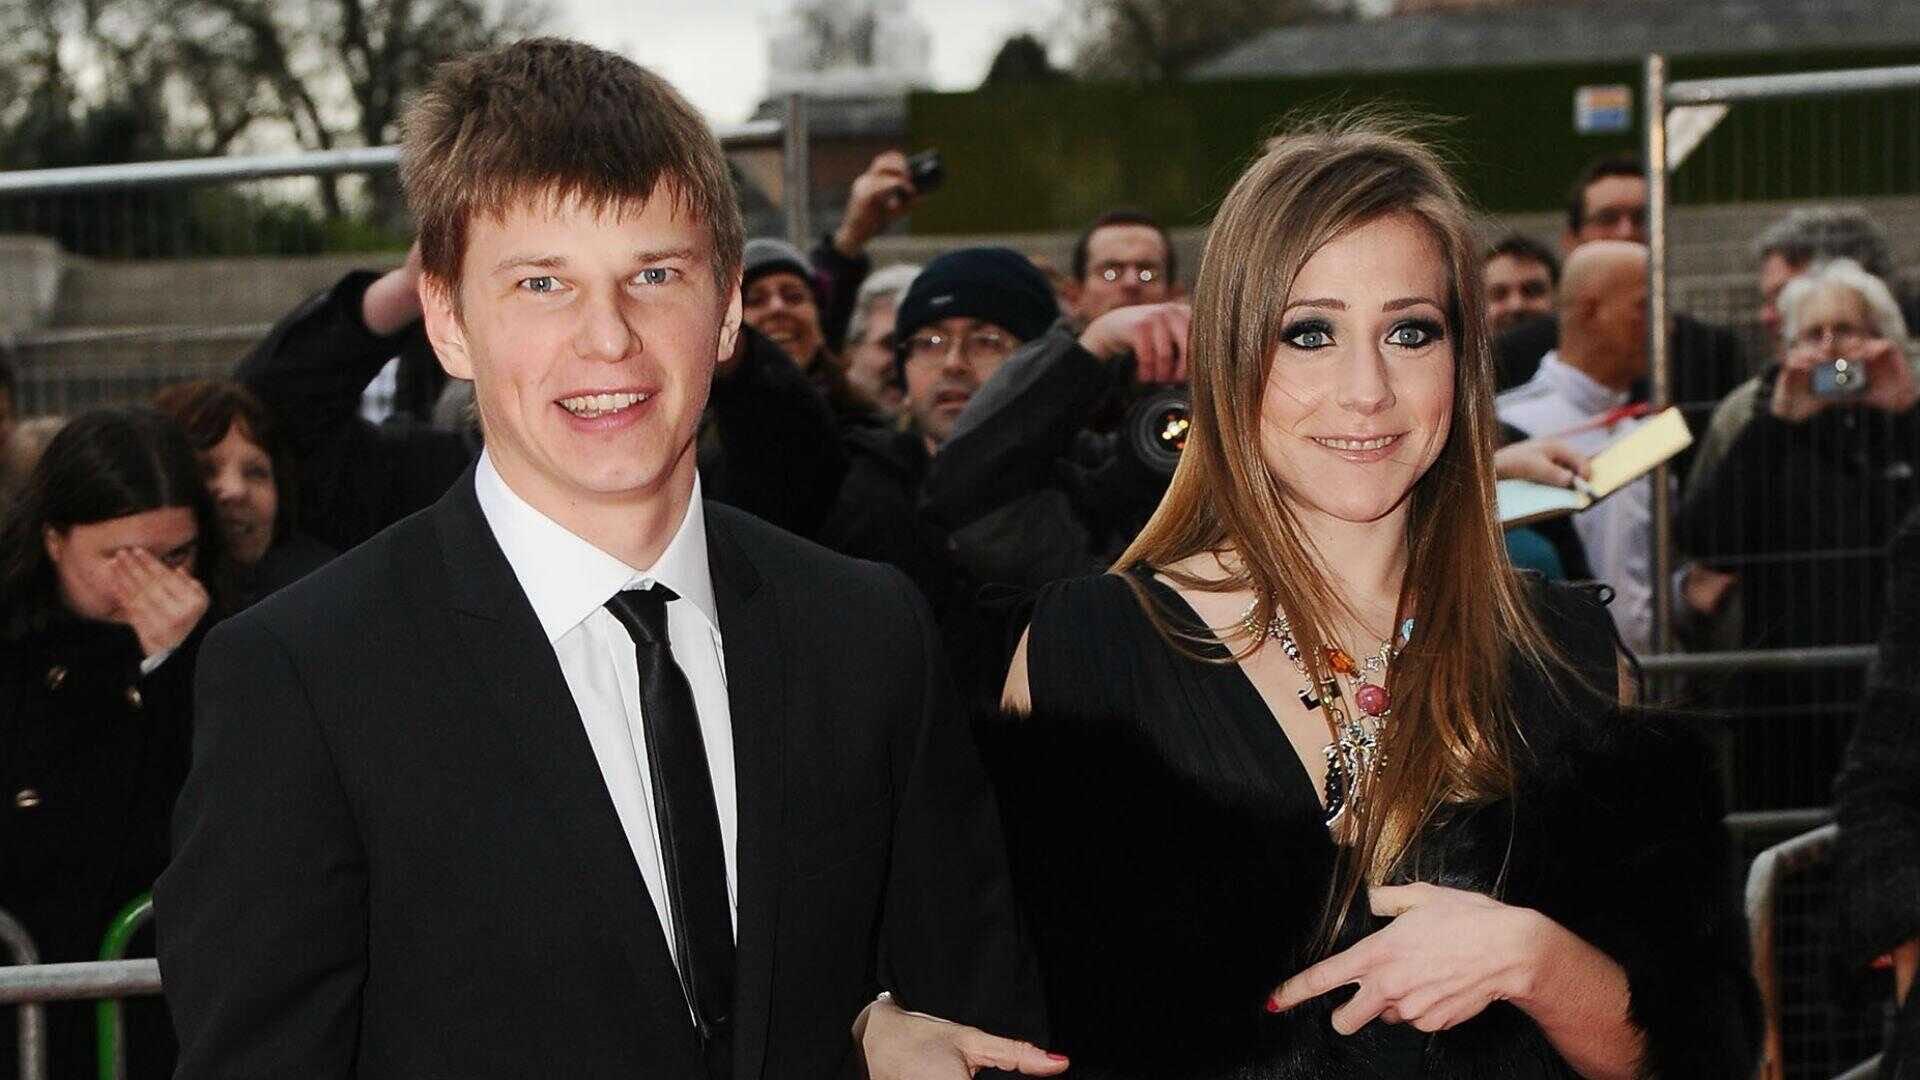 Yulia Baranovskaya again sues Andrey Arshavin